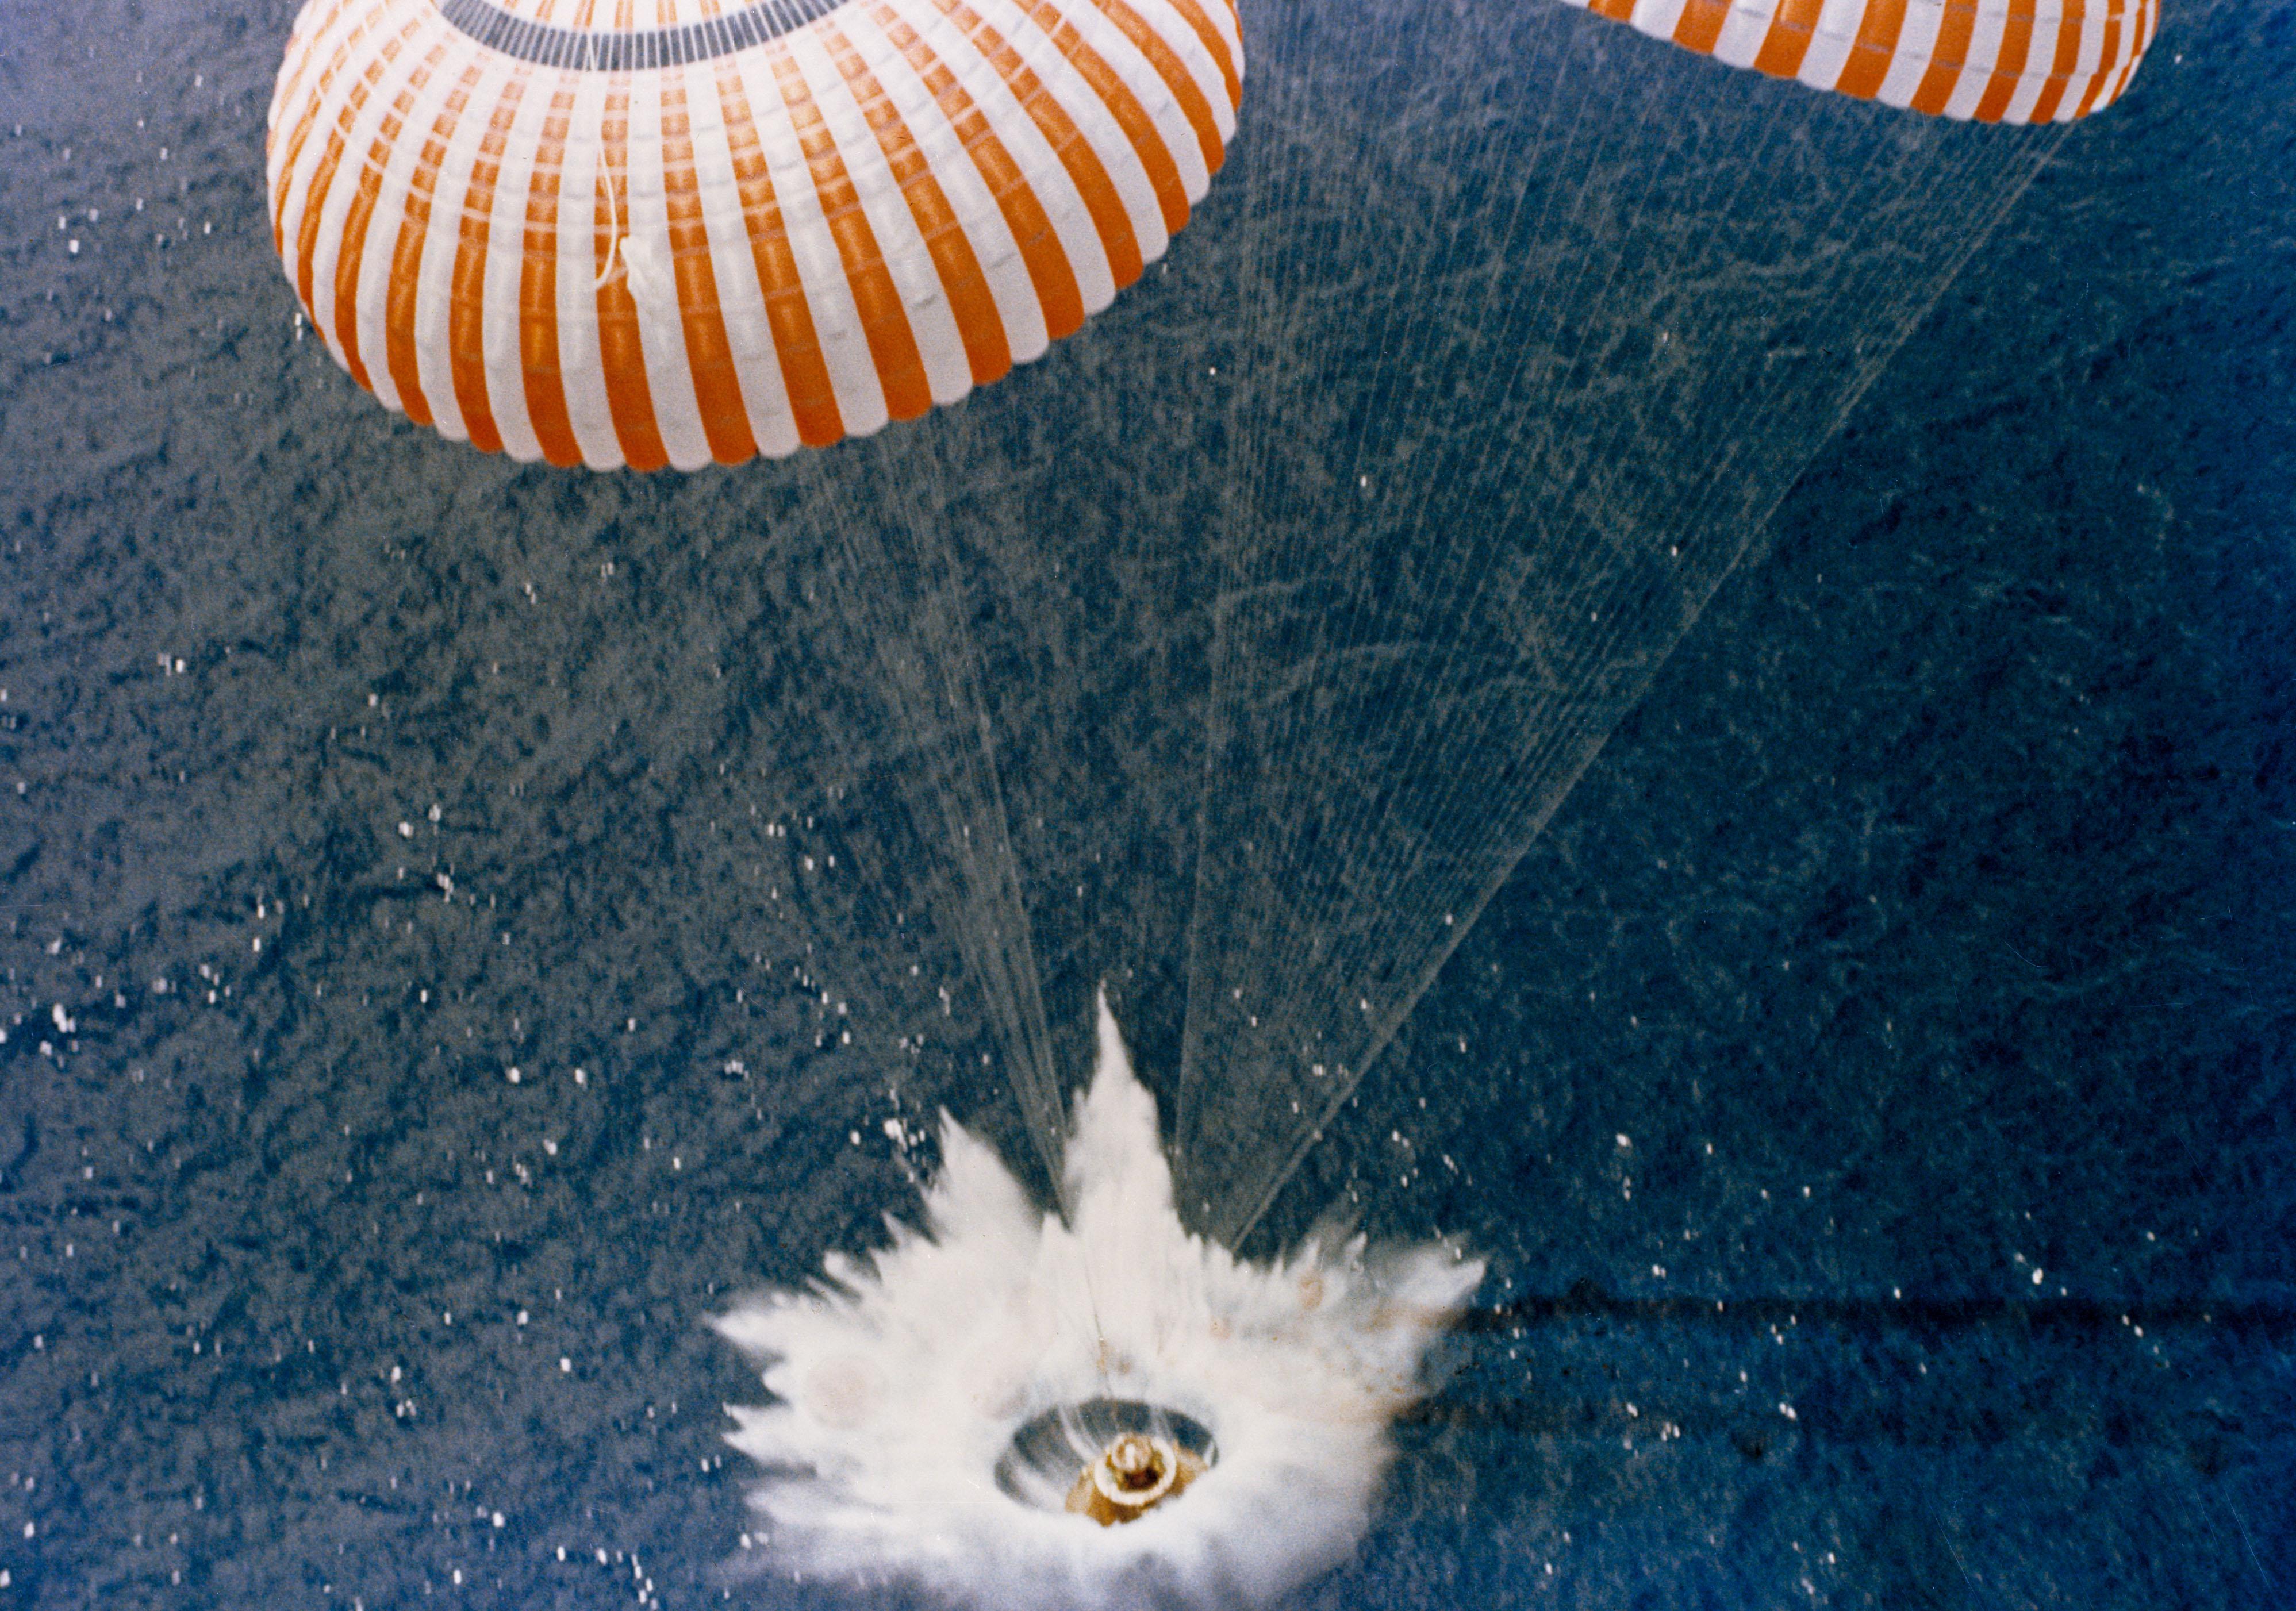 File:Apollo 15 splashdown.jpg - Wikimedia Commons